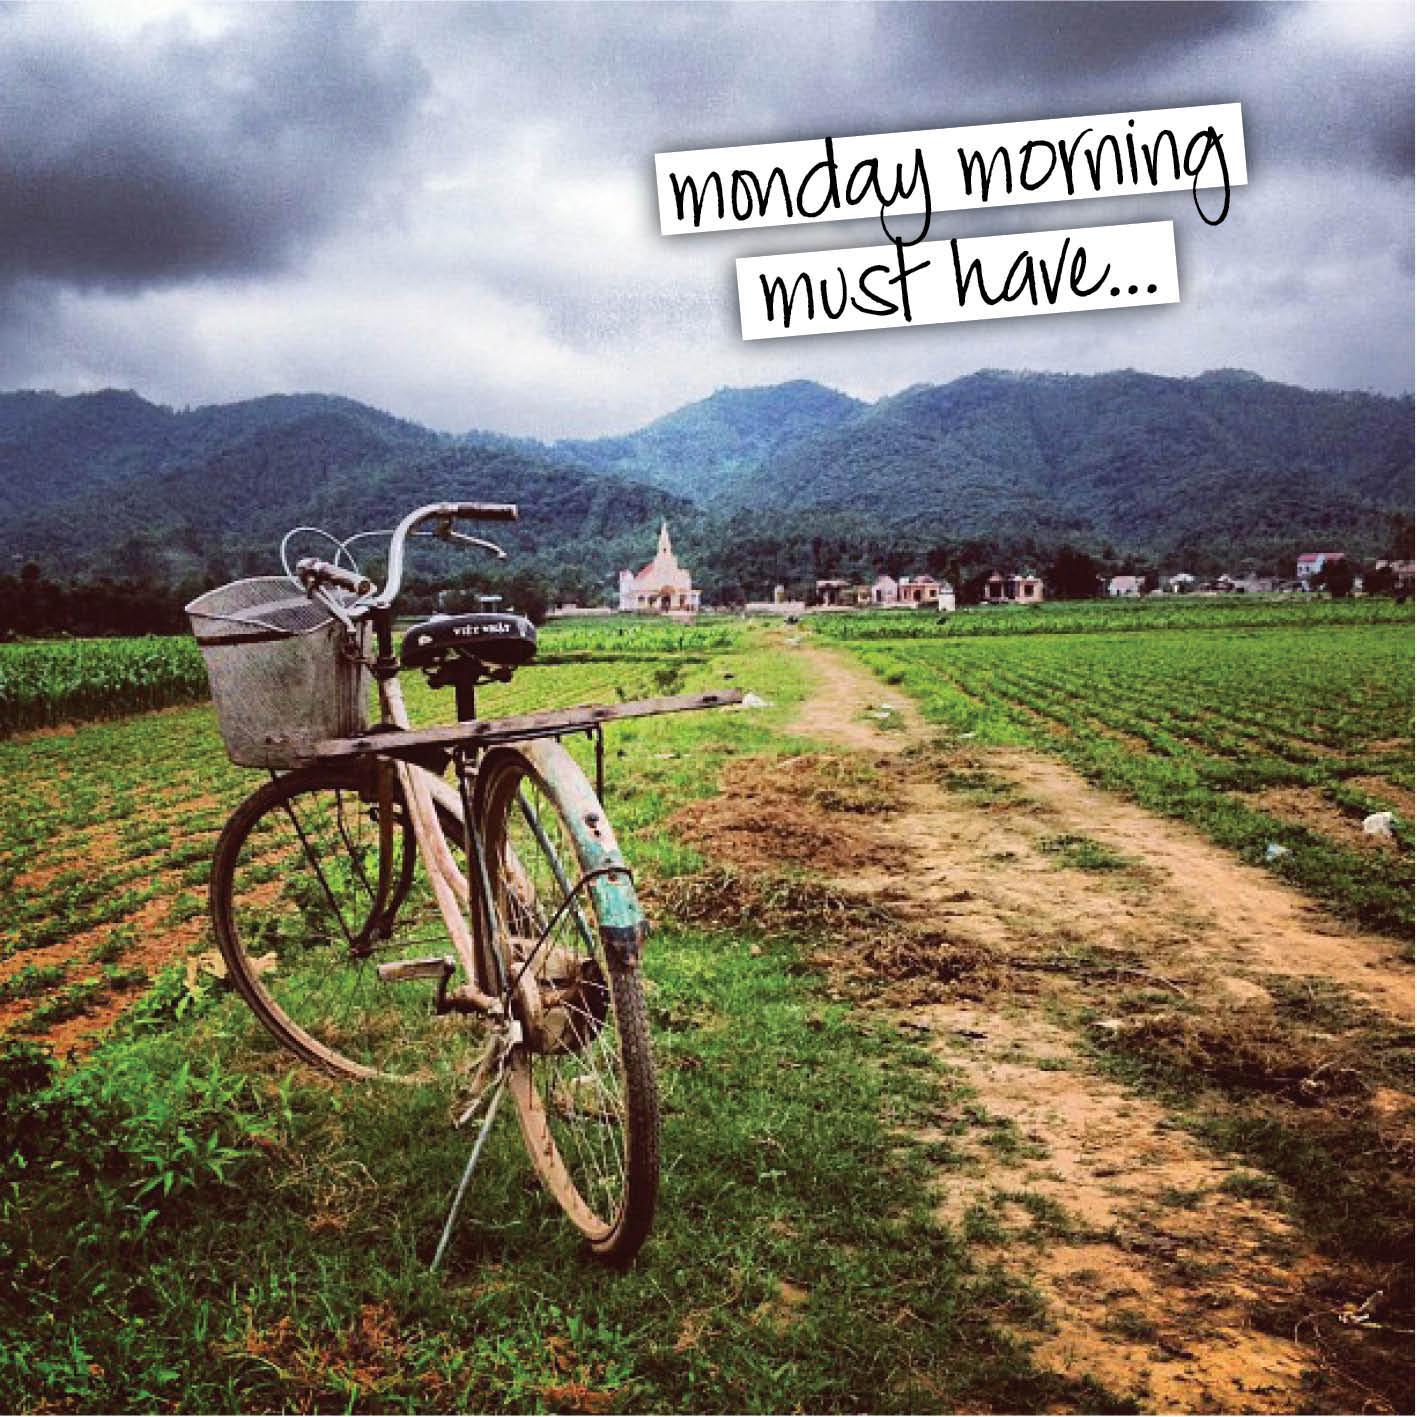 MondayTravel